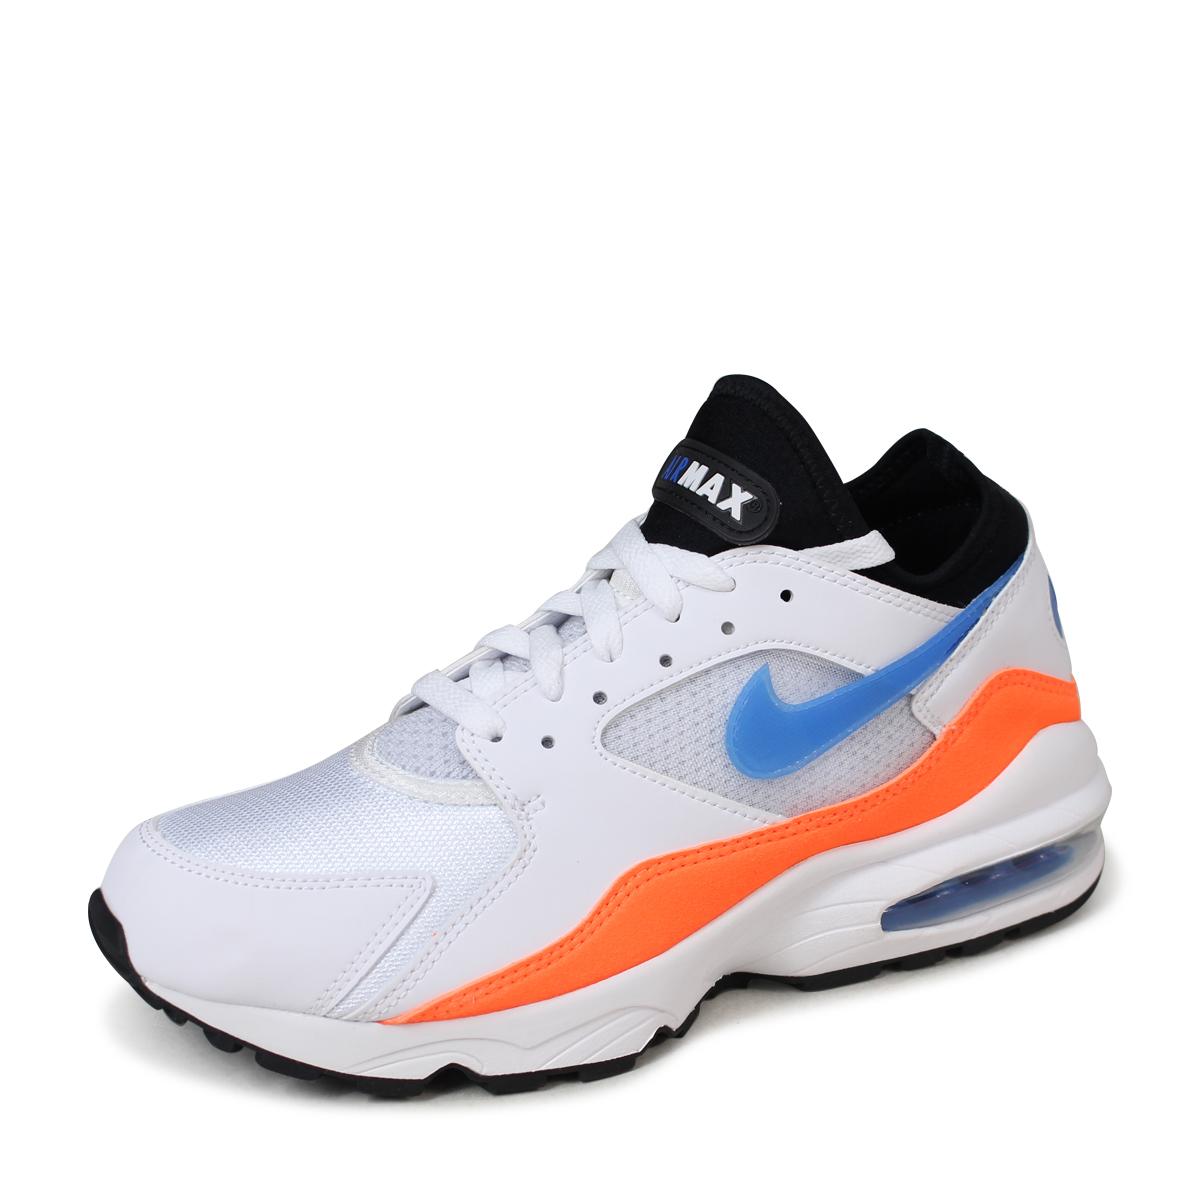 77d490fcb60c2 ... NIKE AIR MAX 93 Kie Ney AMAX 93 sneakers men 306,551-104 white [load ...